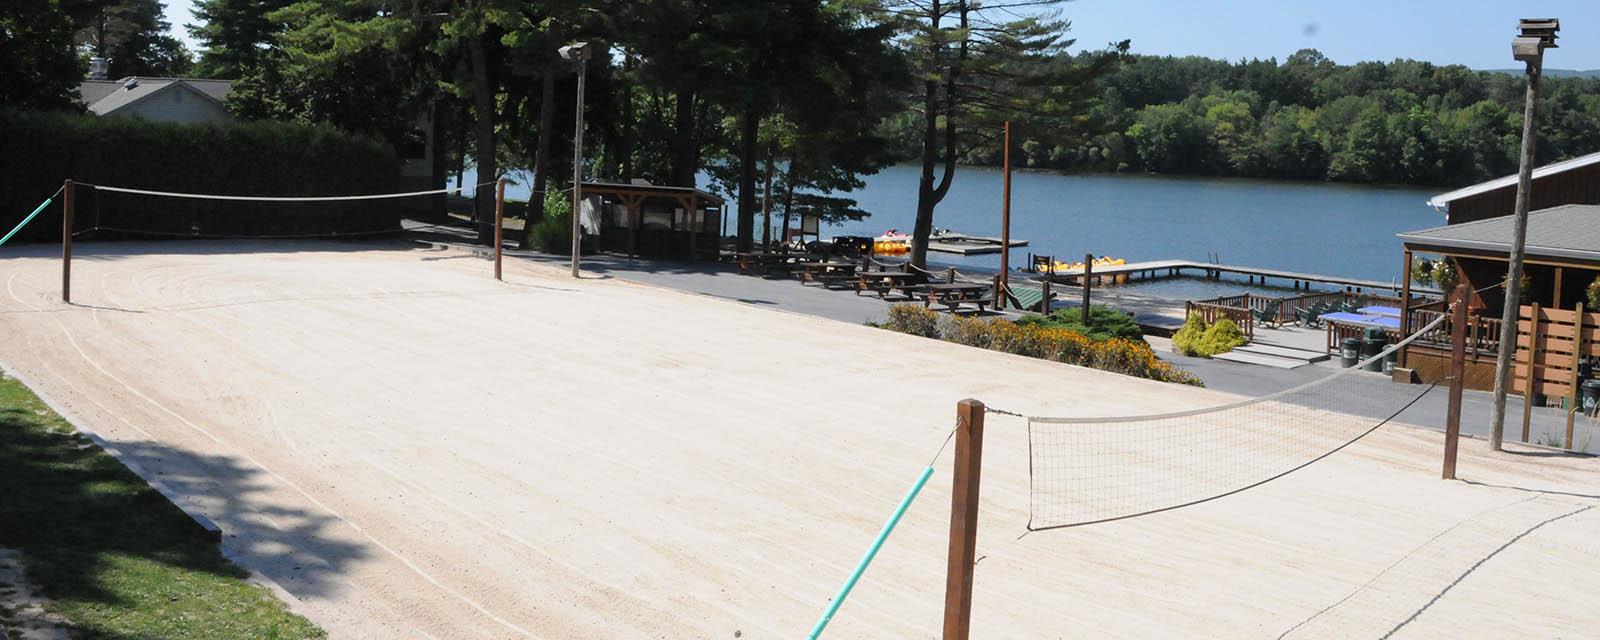 beach volleyball course